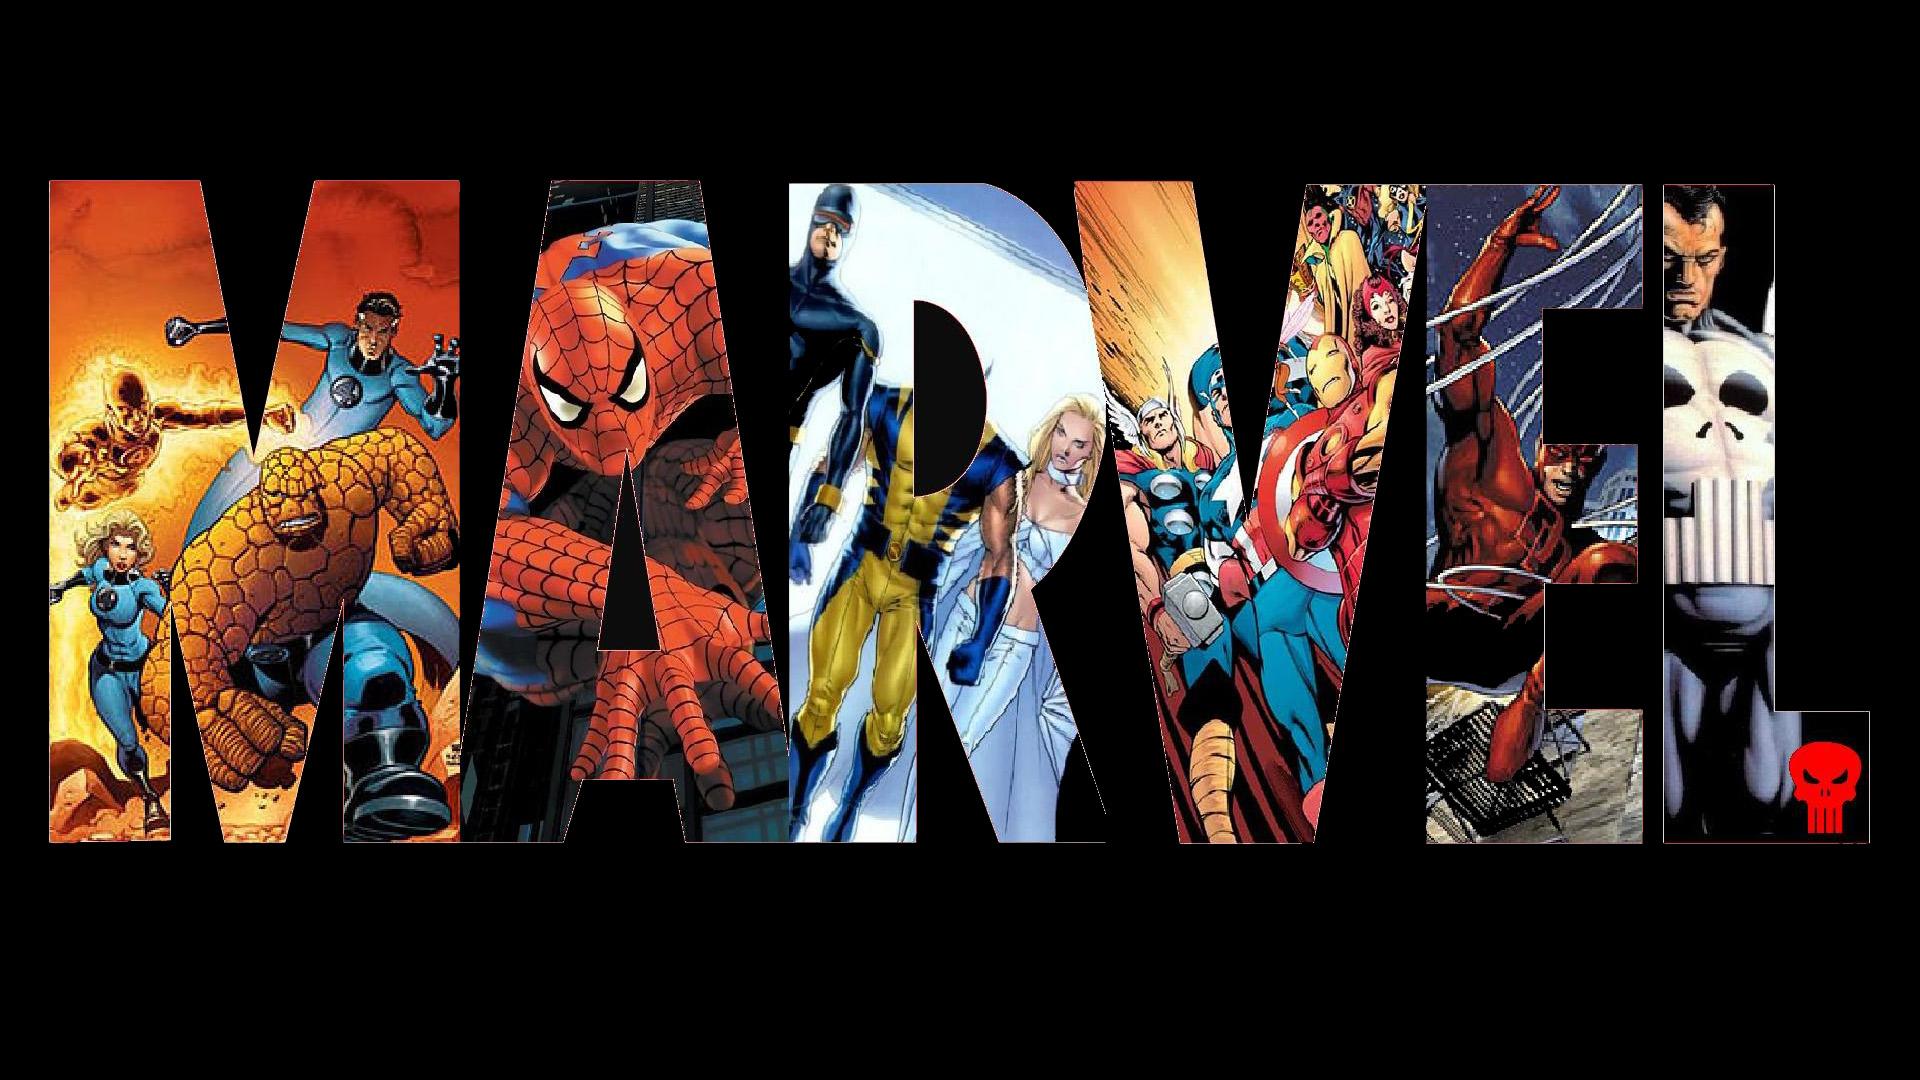 Marvel revela el trailer de ¨Avengers: Infinity War¨